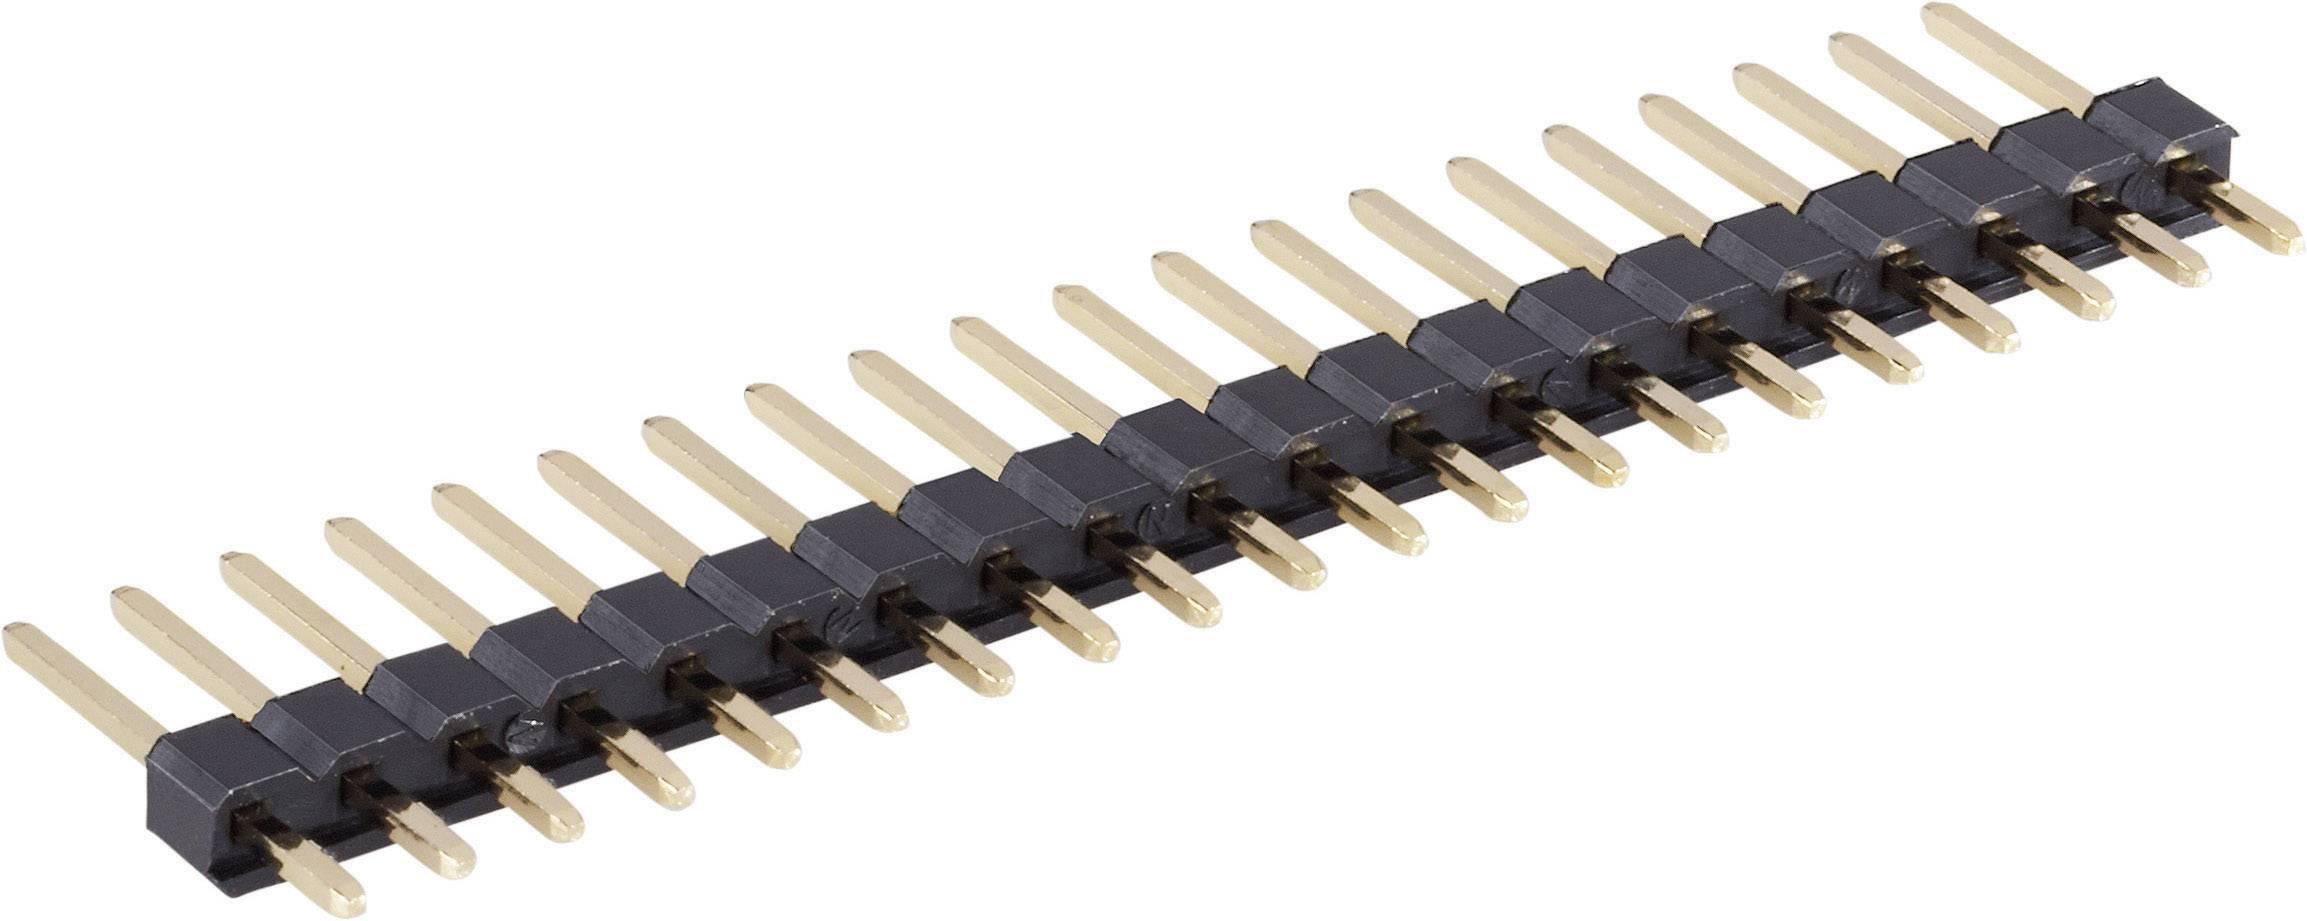 Pinová lišta rovná BKL 10120202, 1 x 8 pól., 2,54 mm, 20,32 x 2,54 x 12,6 mm